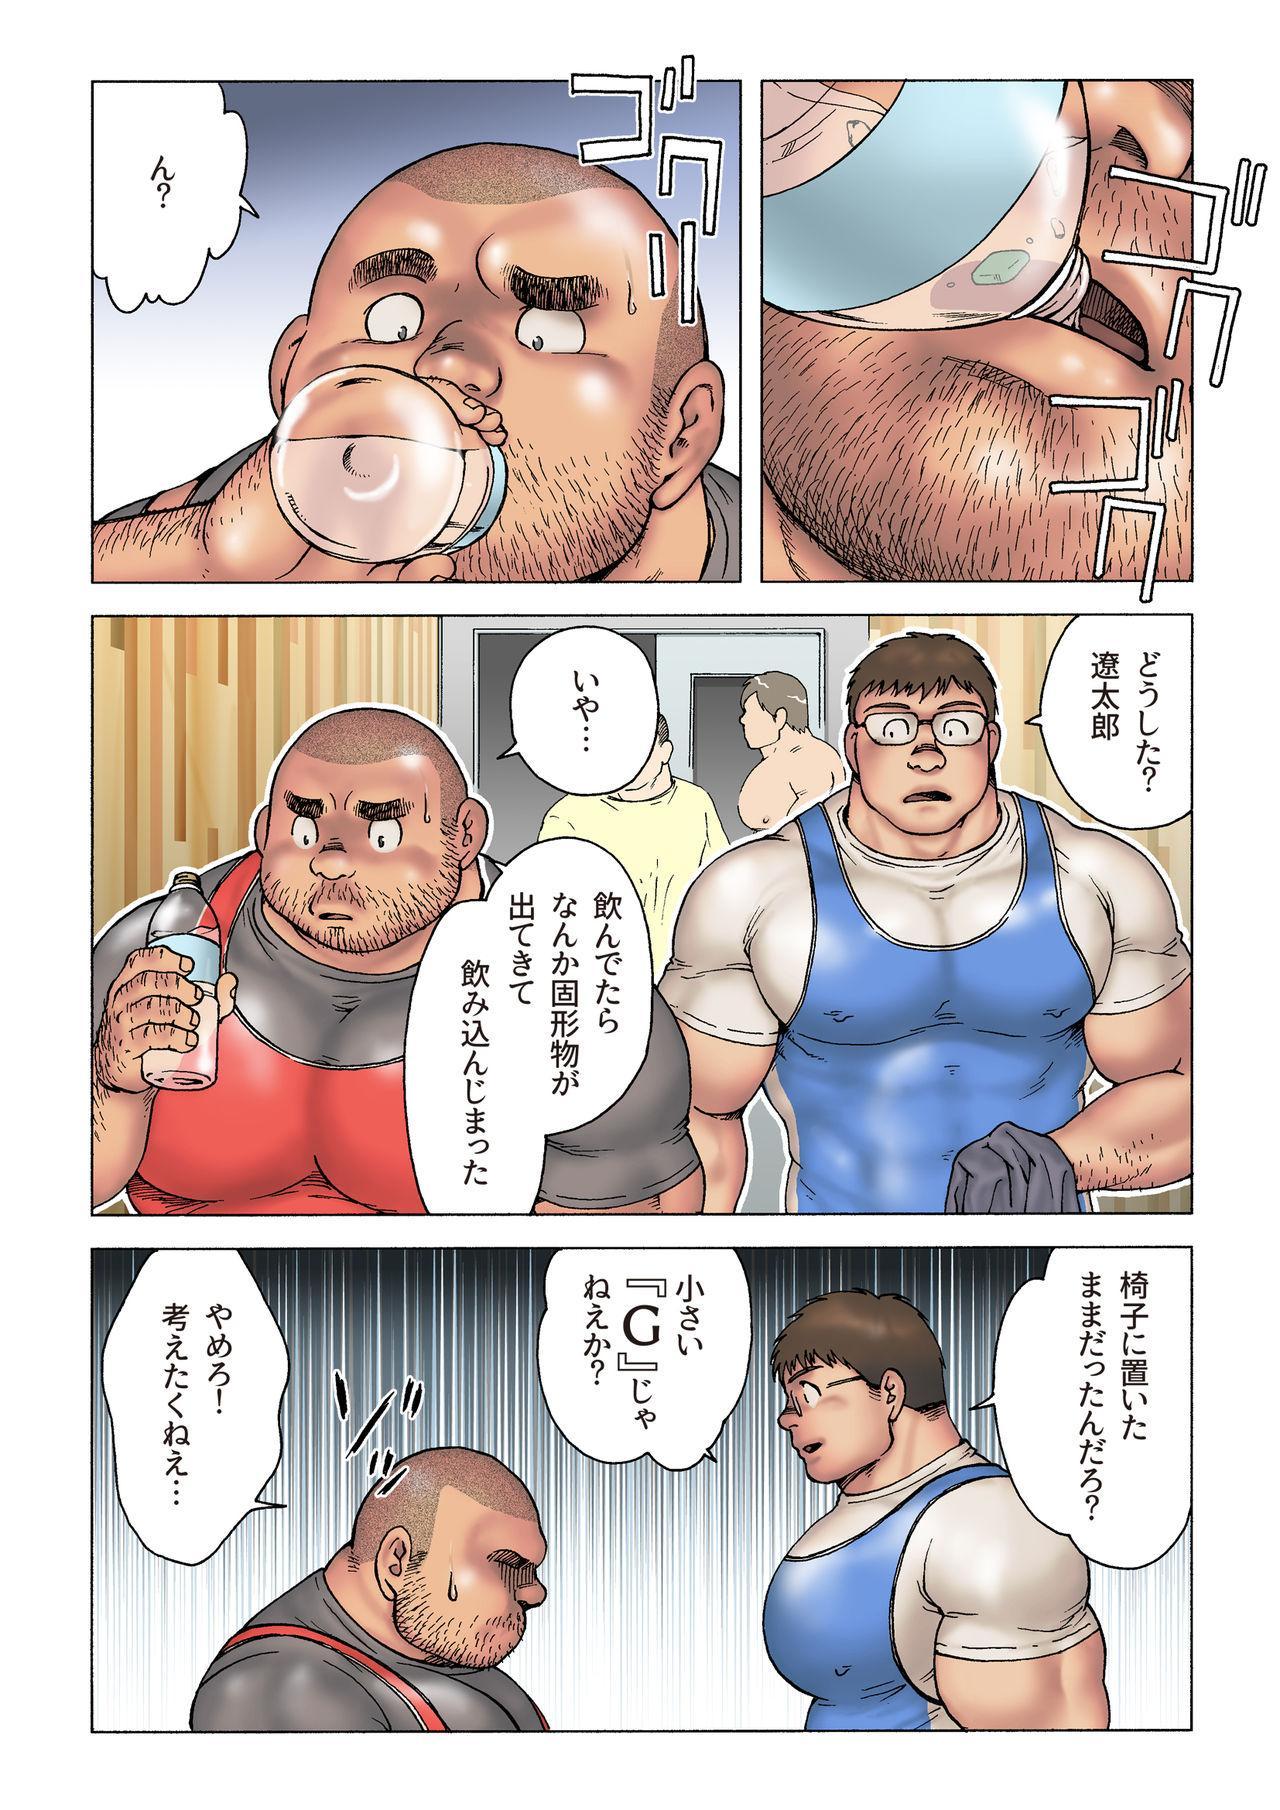 Danshi Koukousei Weightlifter Shiai-chuu, Osae kirenai Wakai Takeri 7